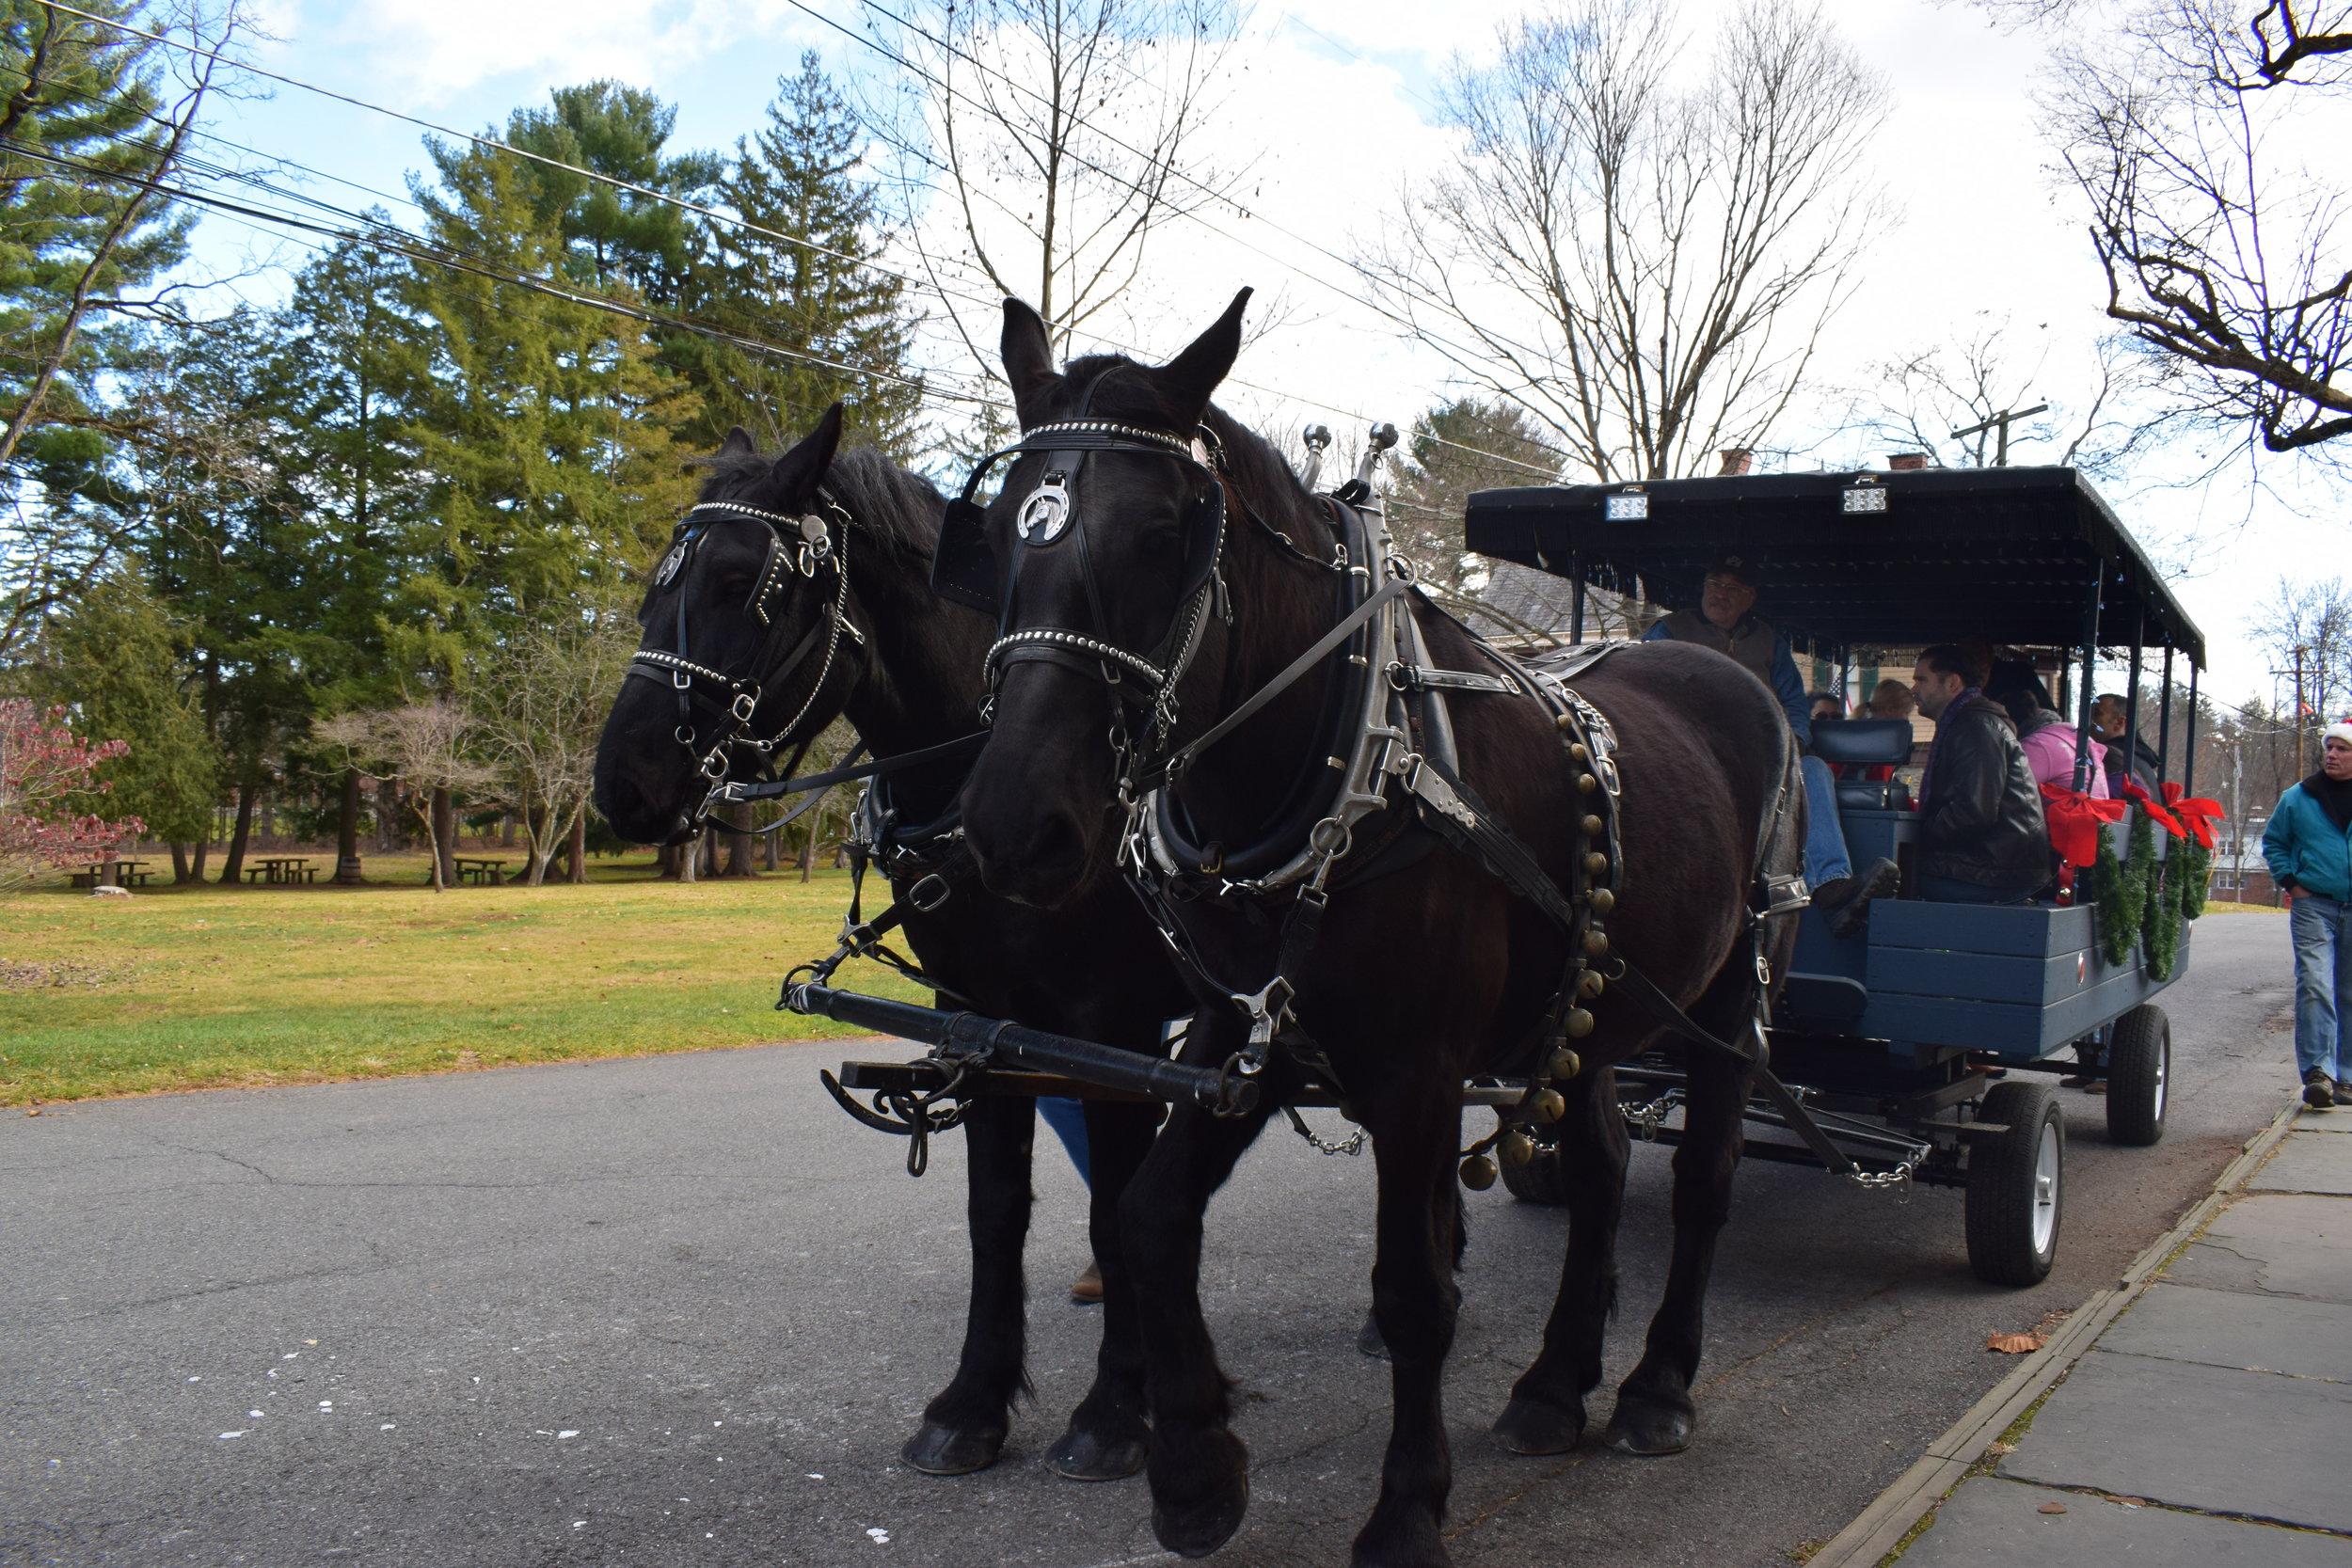 Horse-drawn wagon rides on Huguenot Street